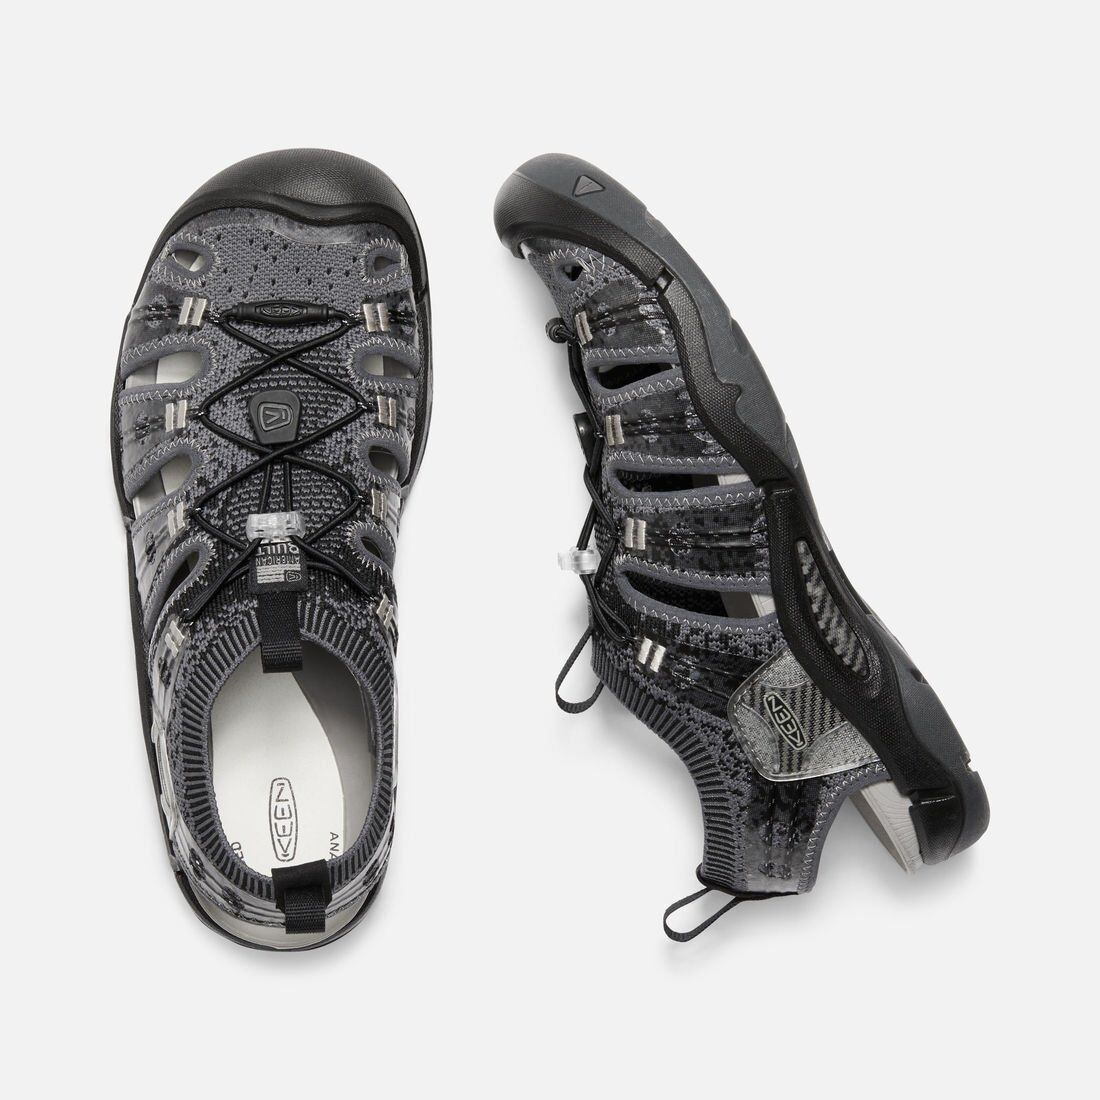 Keen EVOFIT Sandale ONE - SANDALE FÜR HERREN  Sandale EVOFIT 1019301 b1112f